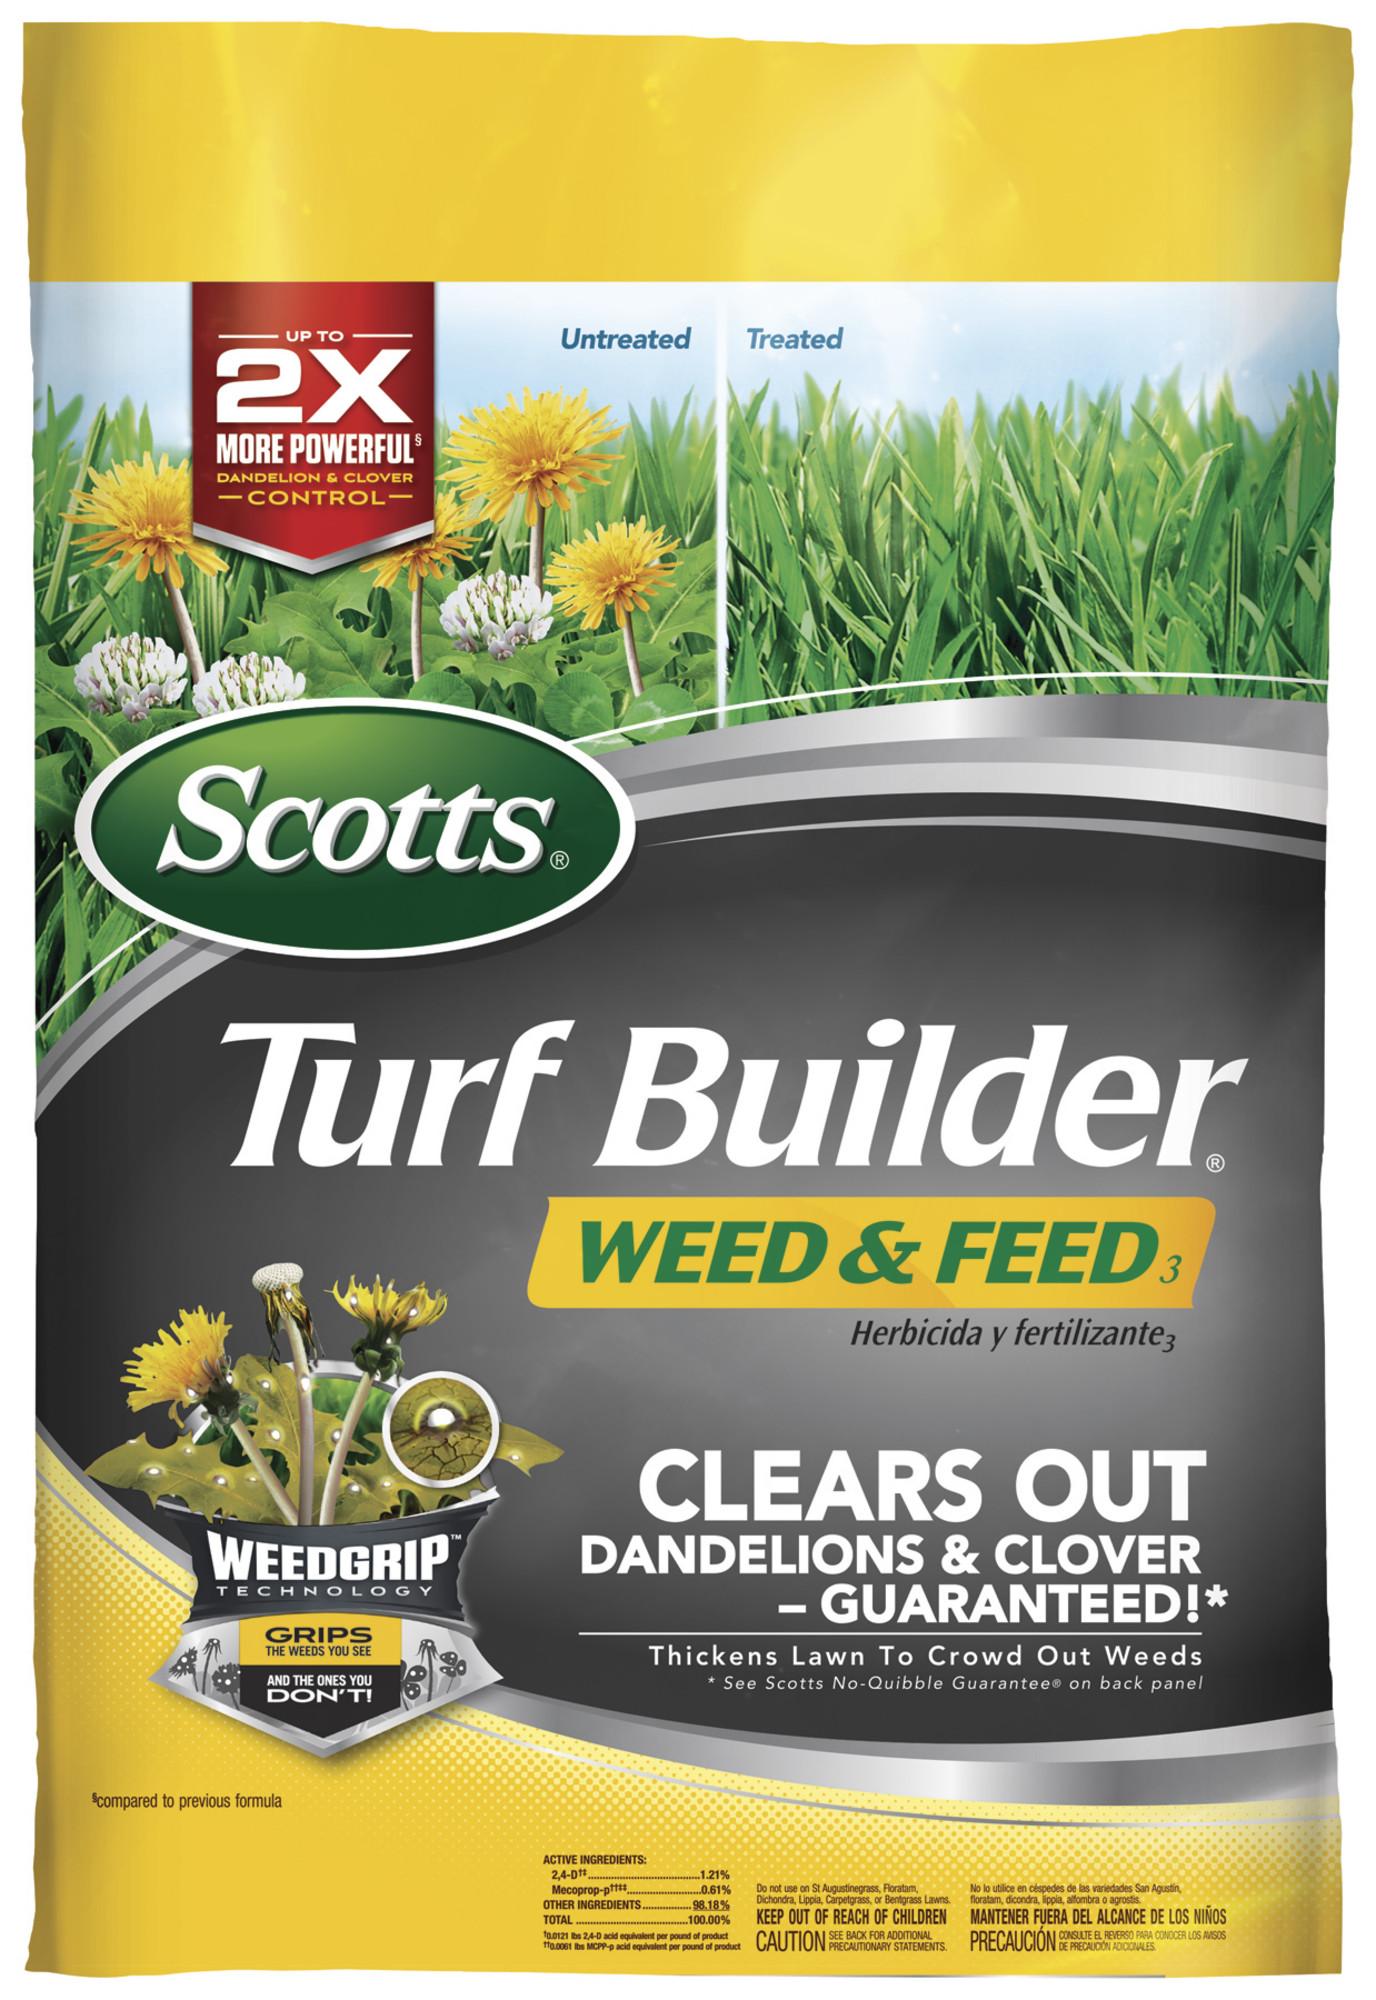 Scotts Turf Builder 15,000 sq ft $11.25 at Walmart B&M, YMMV